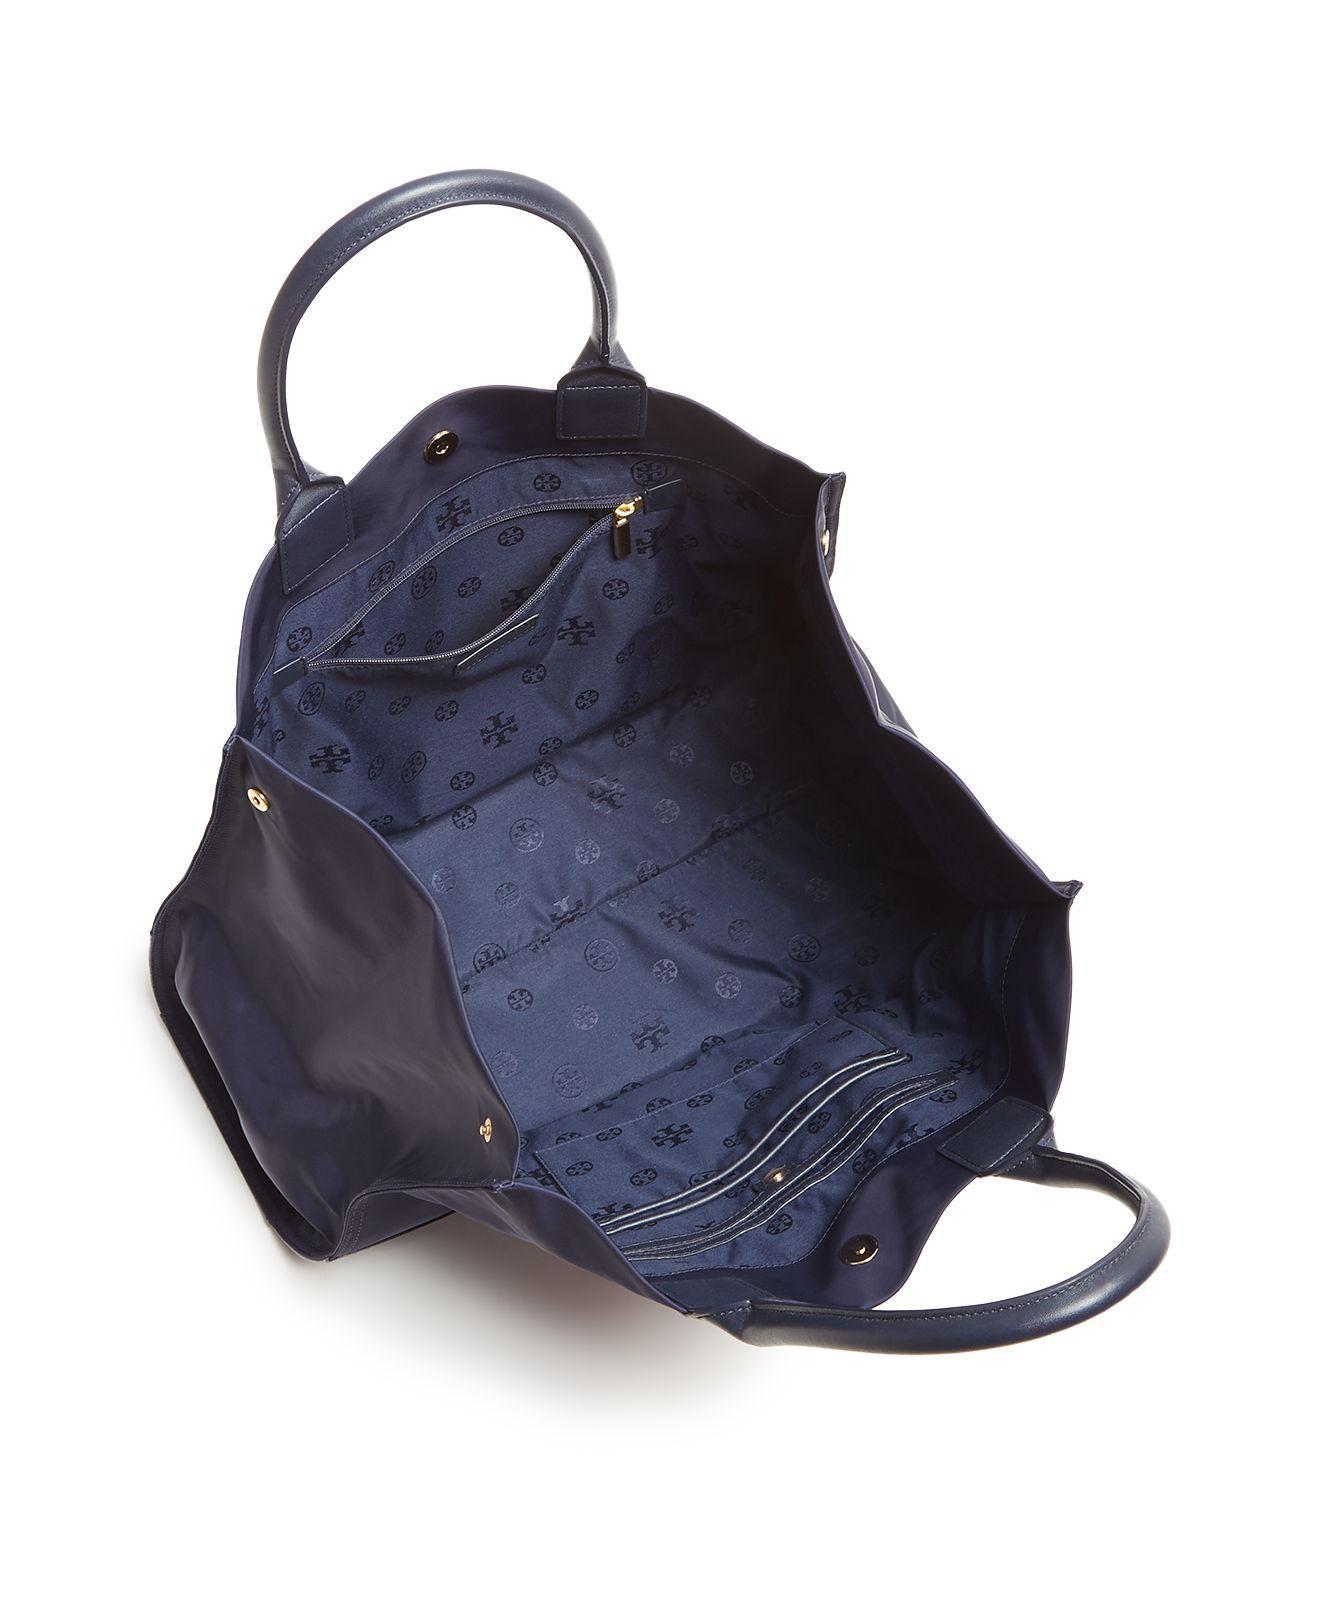 c55aa483499 Lyst - Tory Burch Ella Beaded Logo Tote in Blue